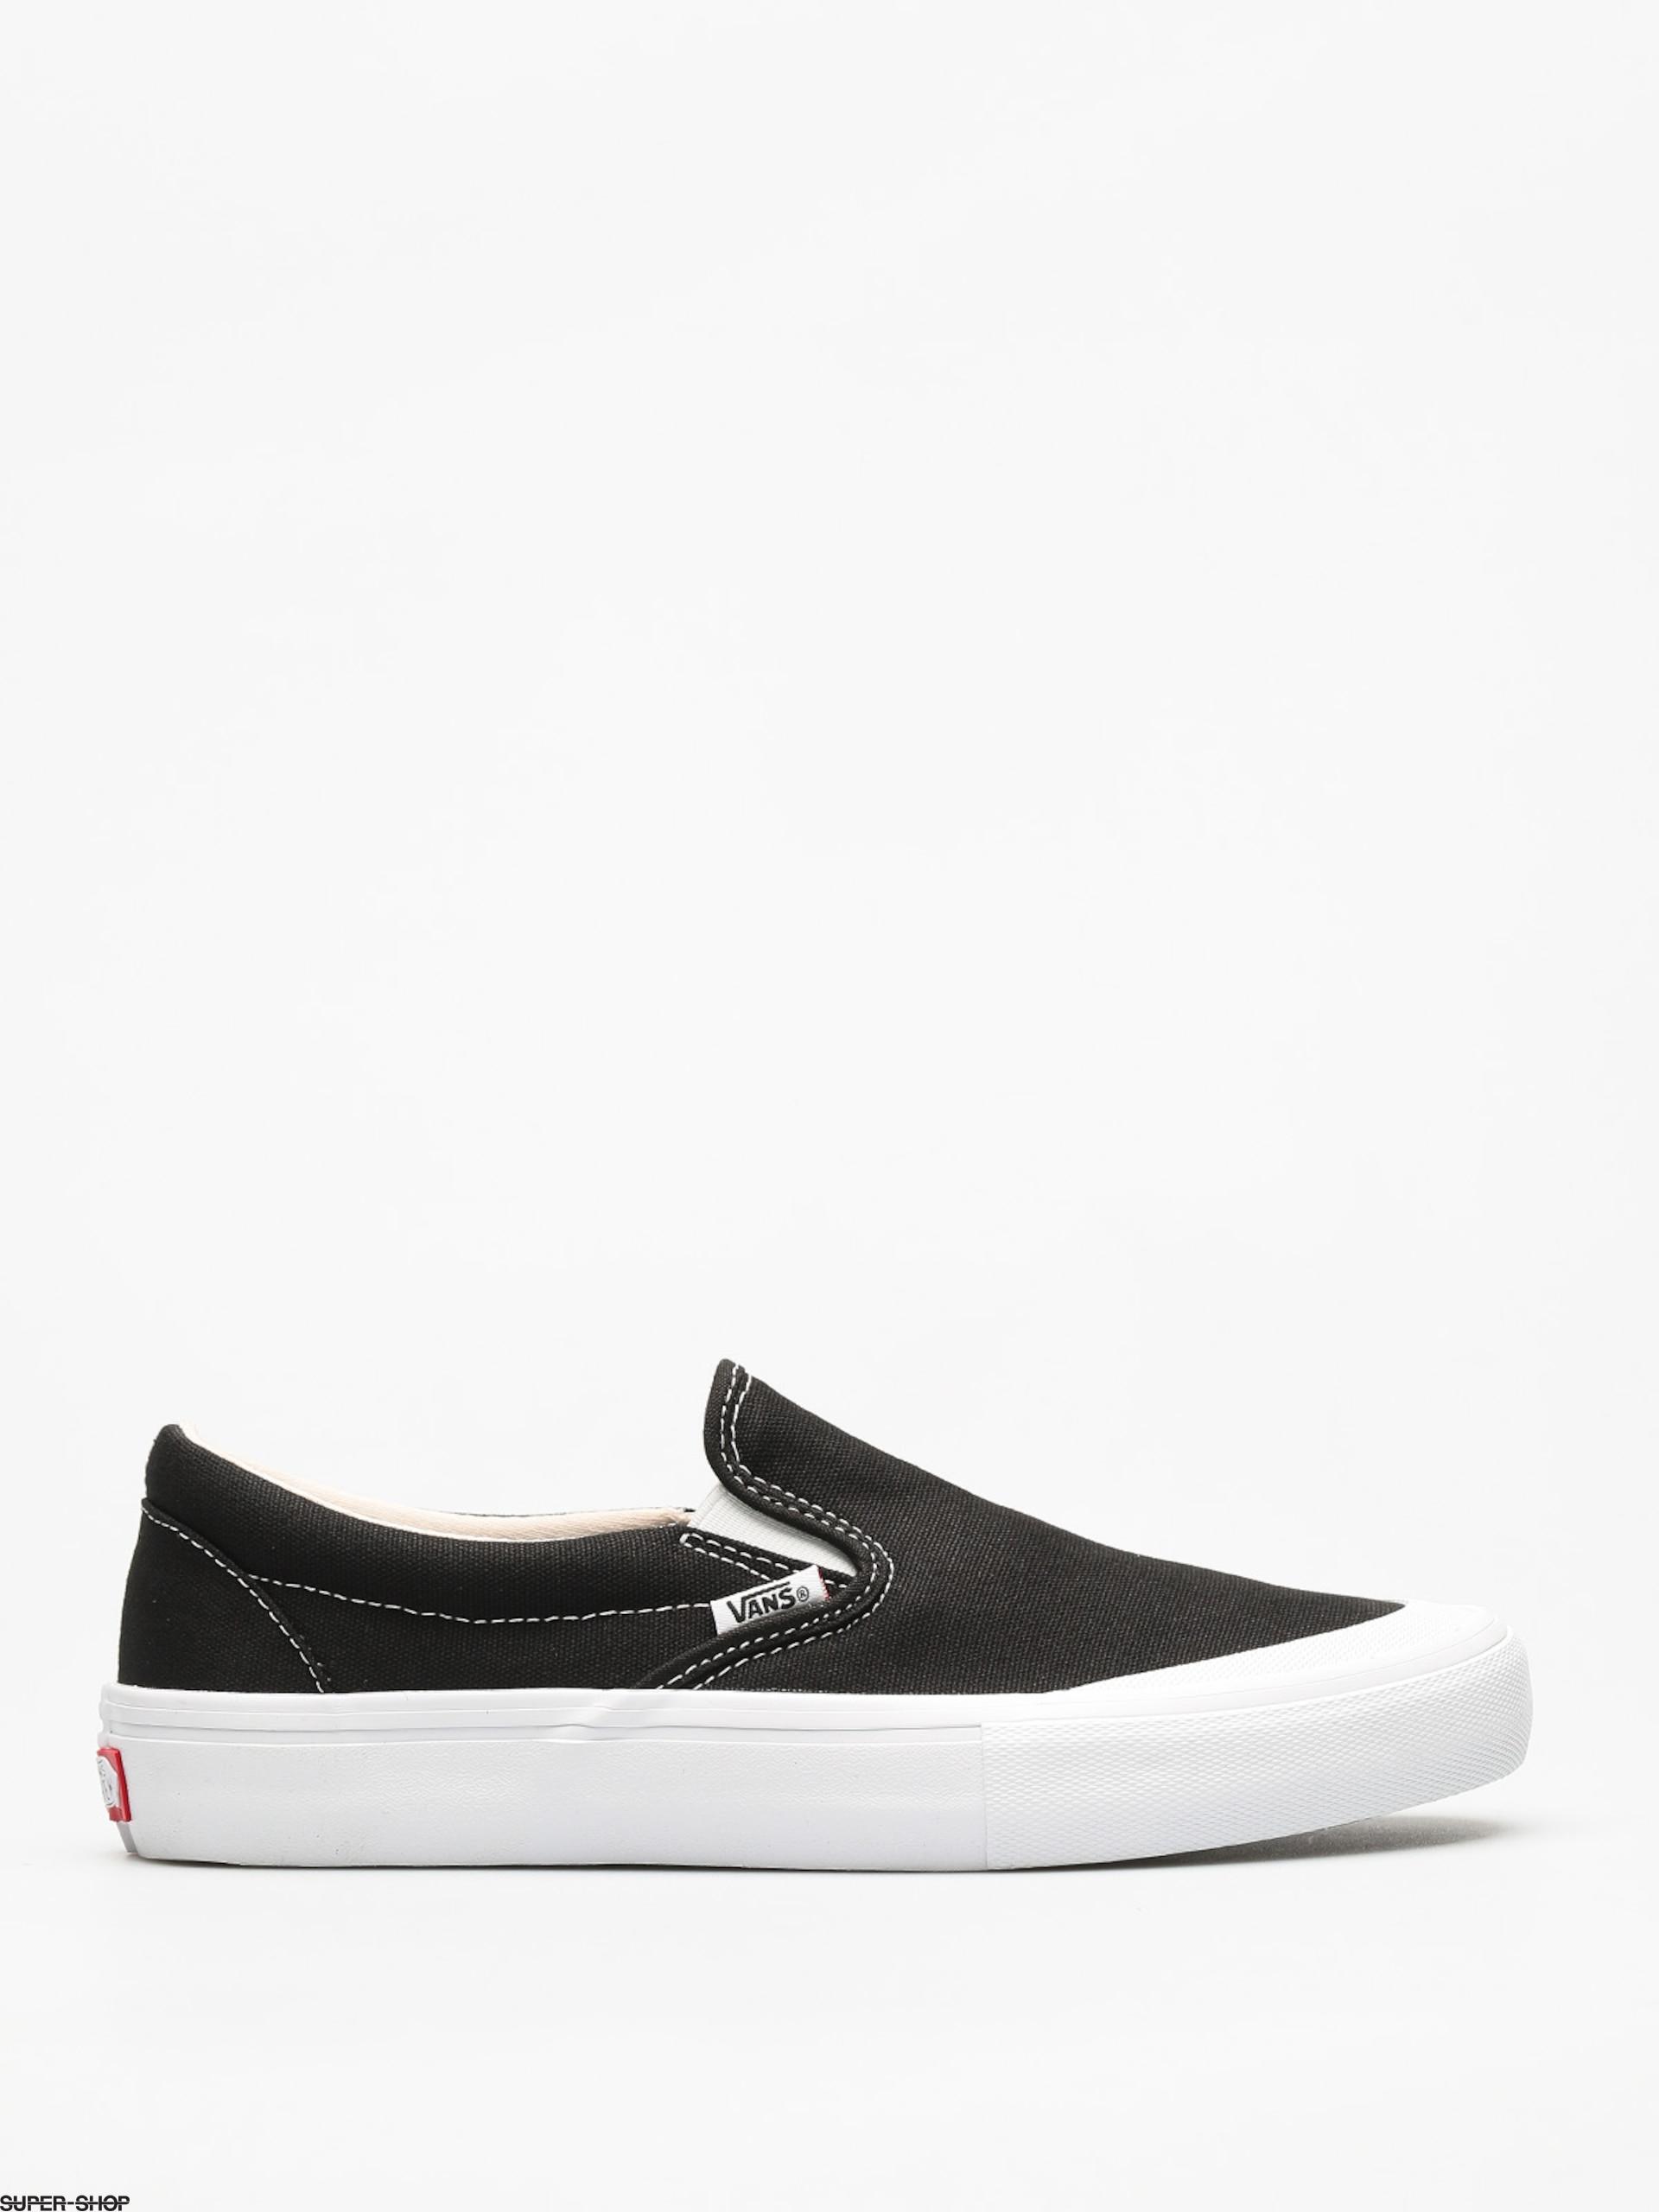 Vans Shoes Slip On Pro (toe cap/black